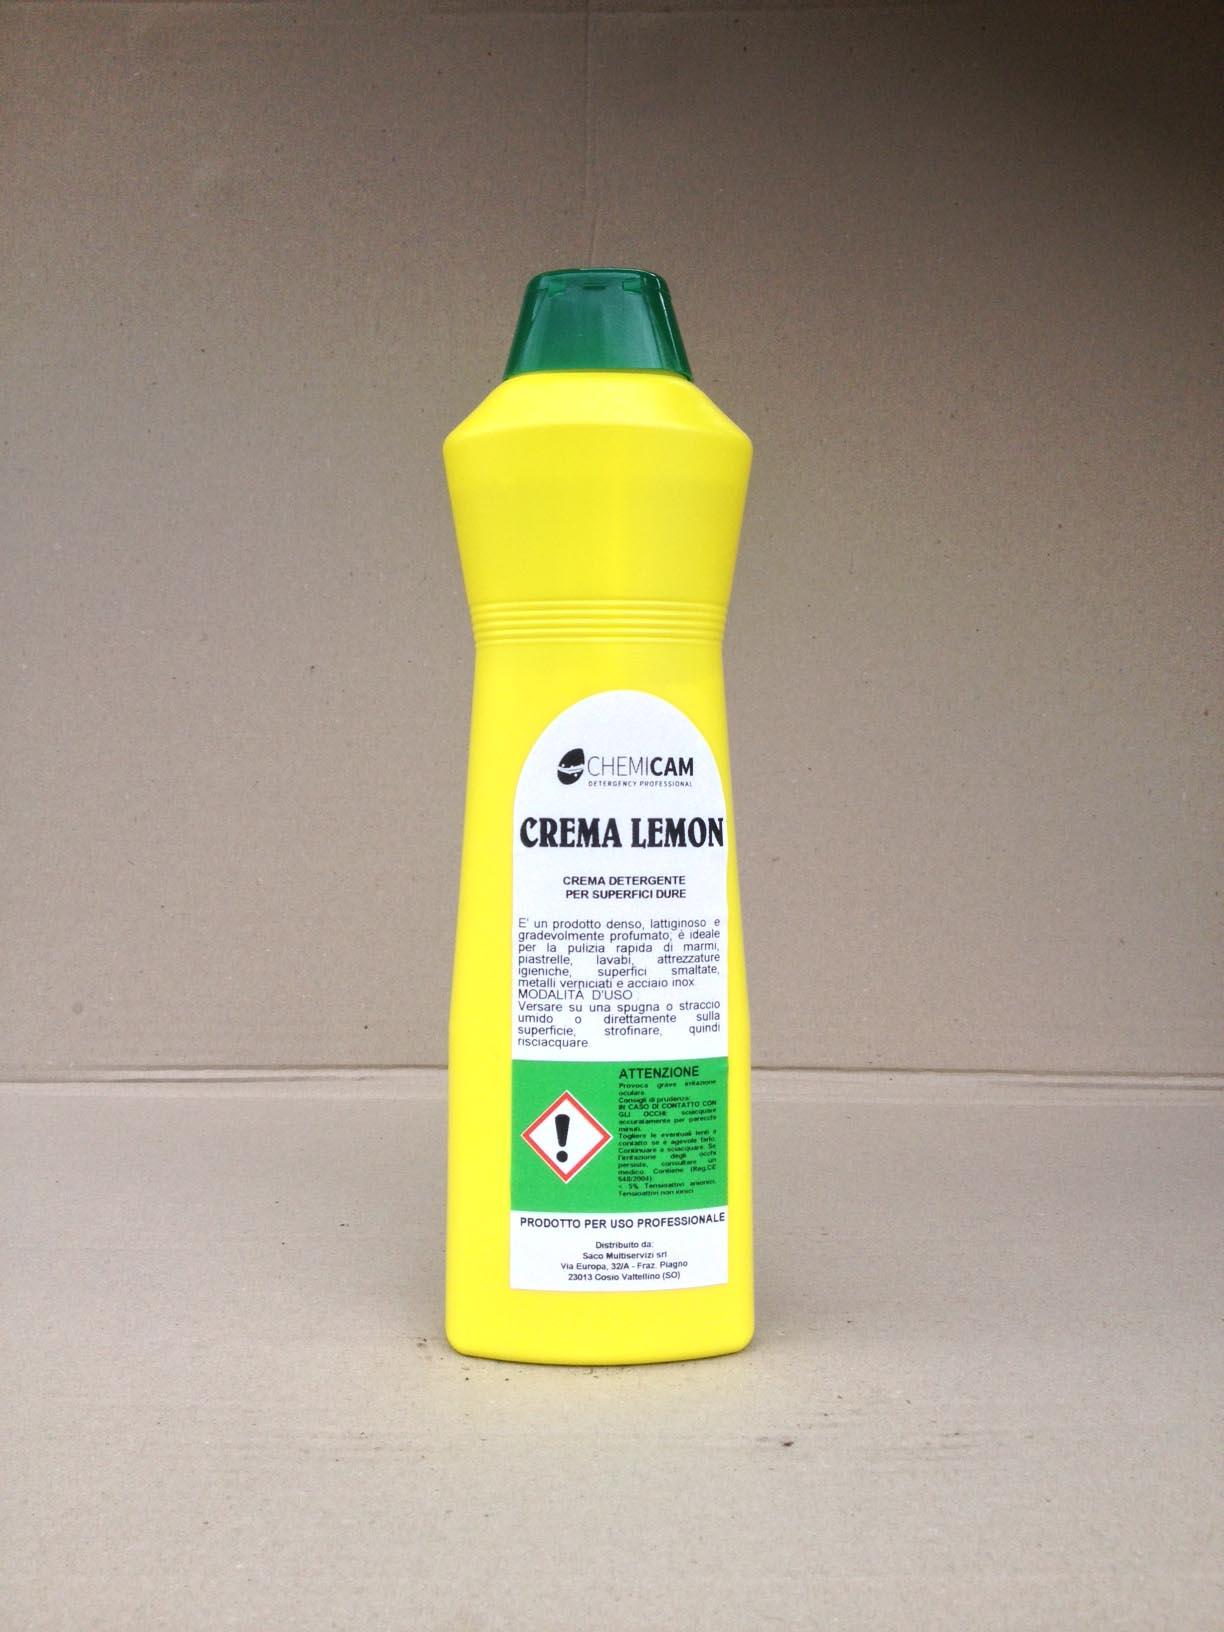 CREMA LEMON - Crema detergente particolarmente adatta per la pulizia quotidiana di superfici dure